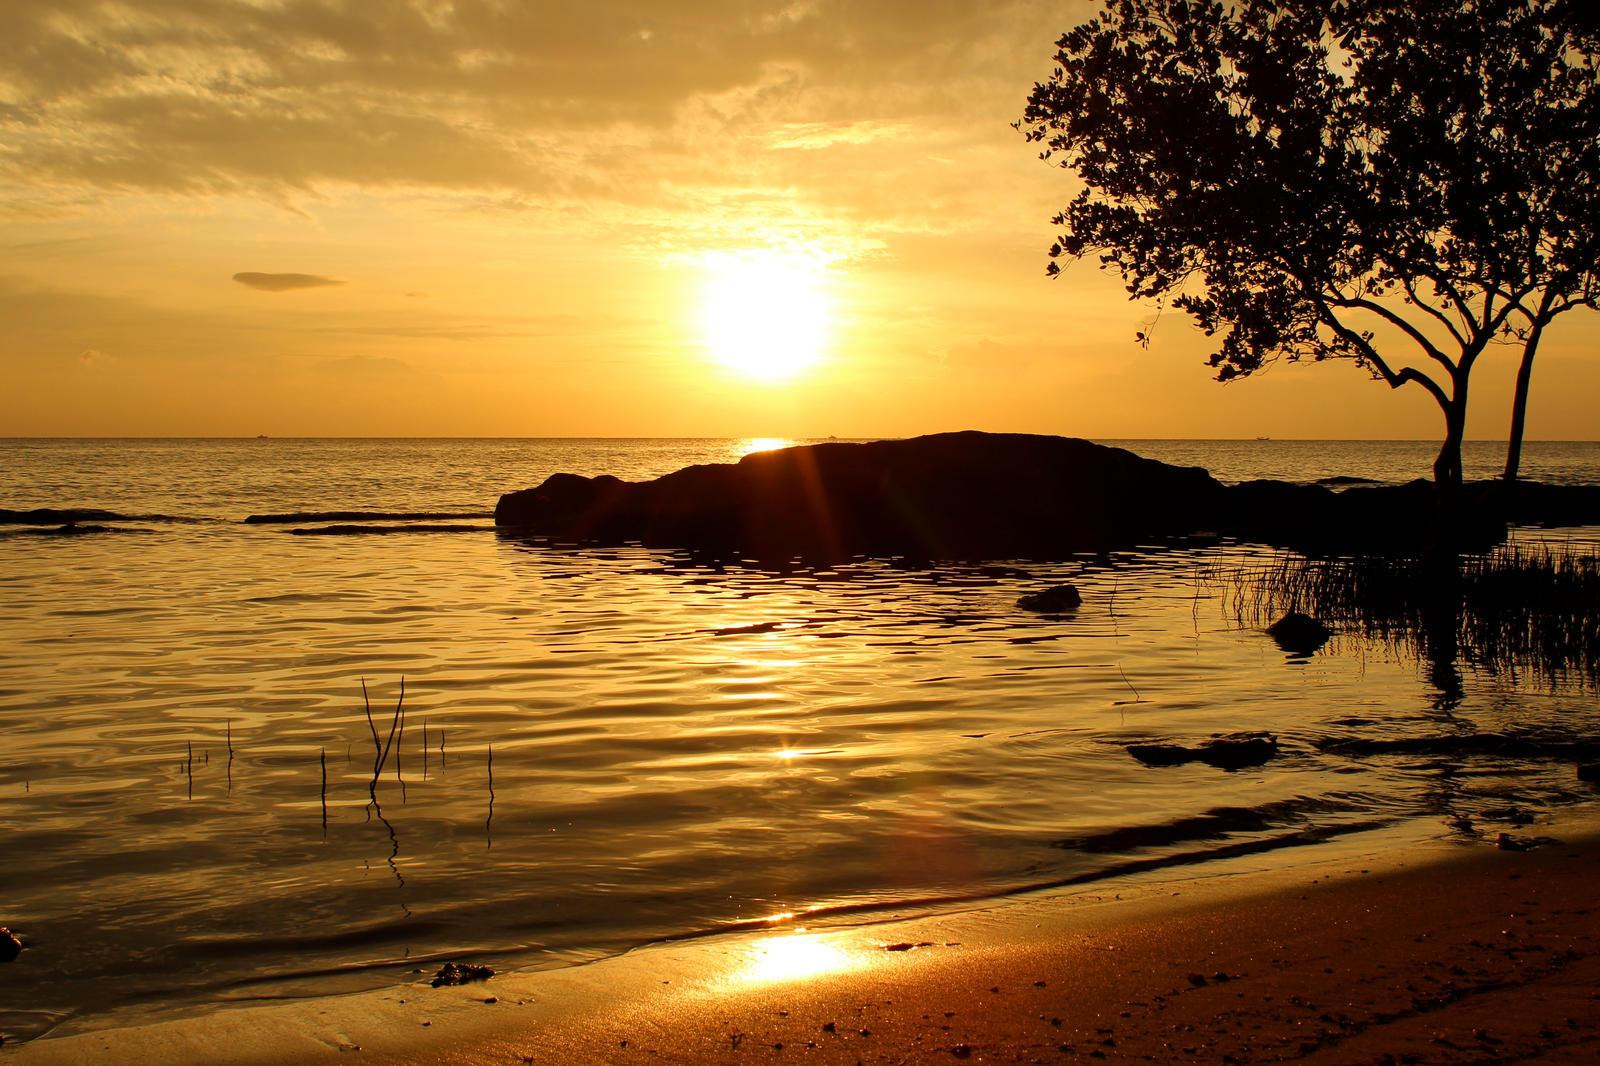 cua can sunset by gypsyskyphotography